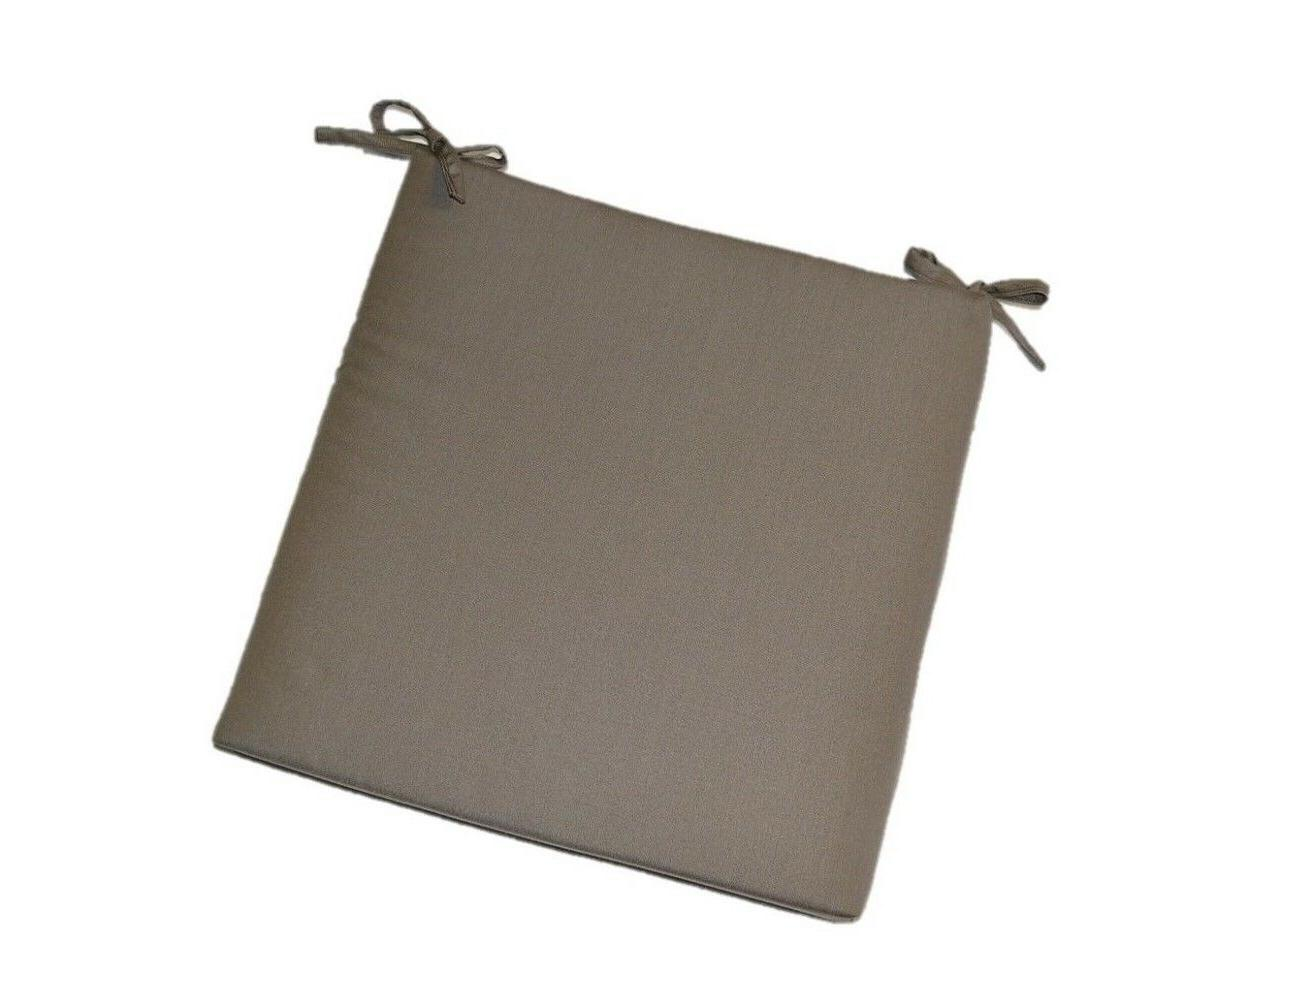 "Sunbrella Canvas Taupe 2"" Foam Seat Cushion w/ Ties - Choose"